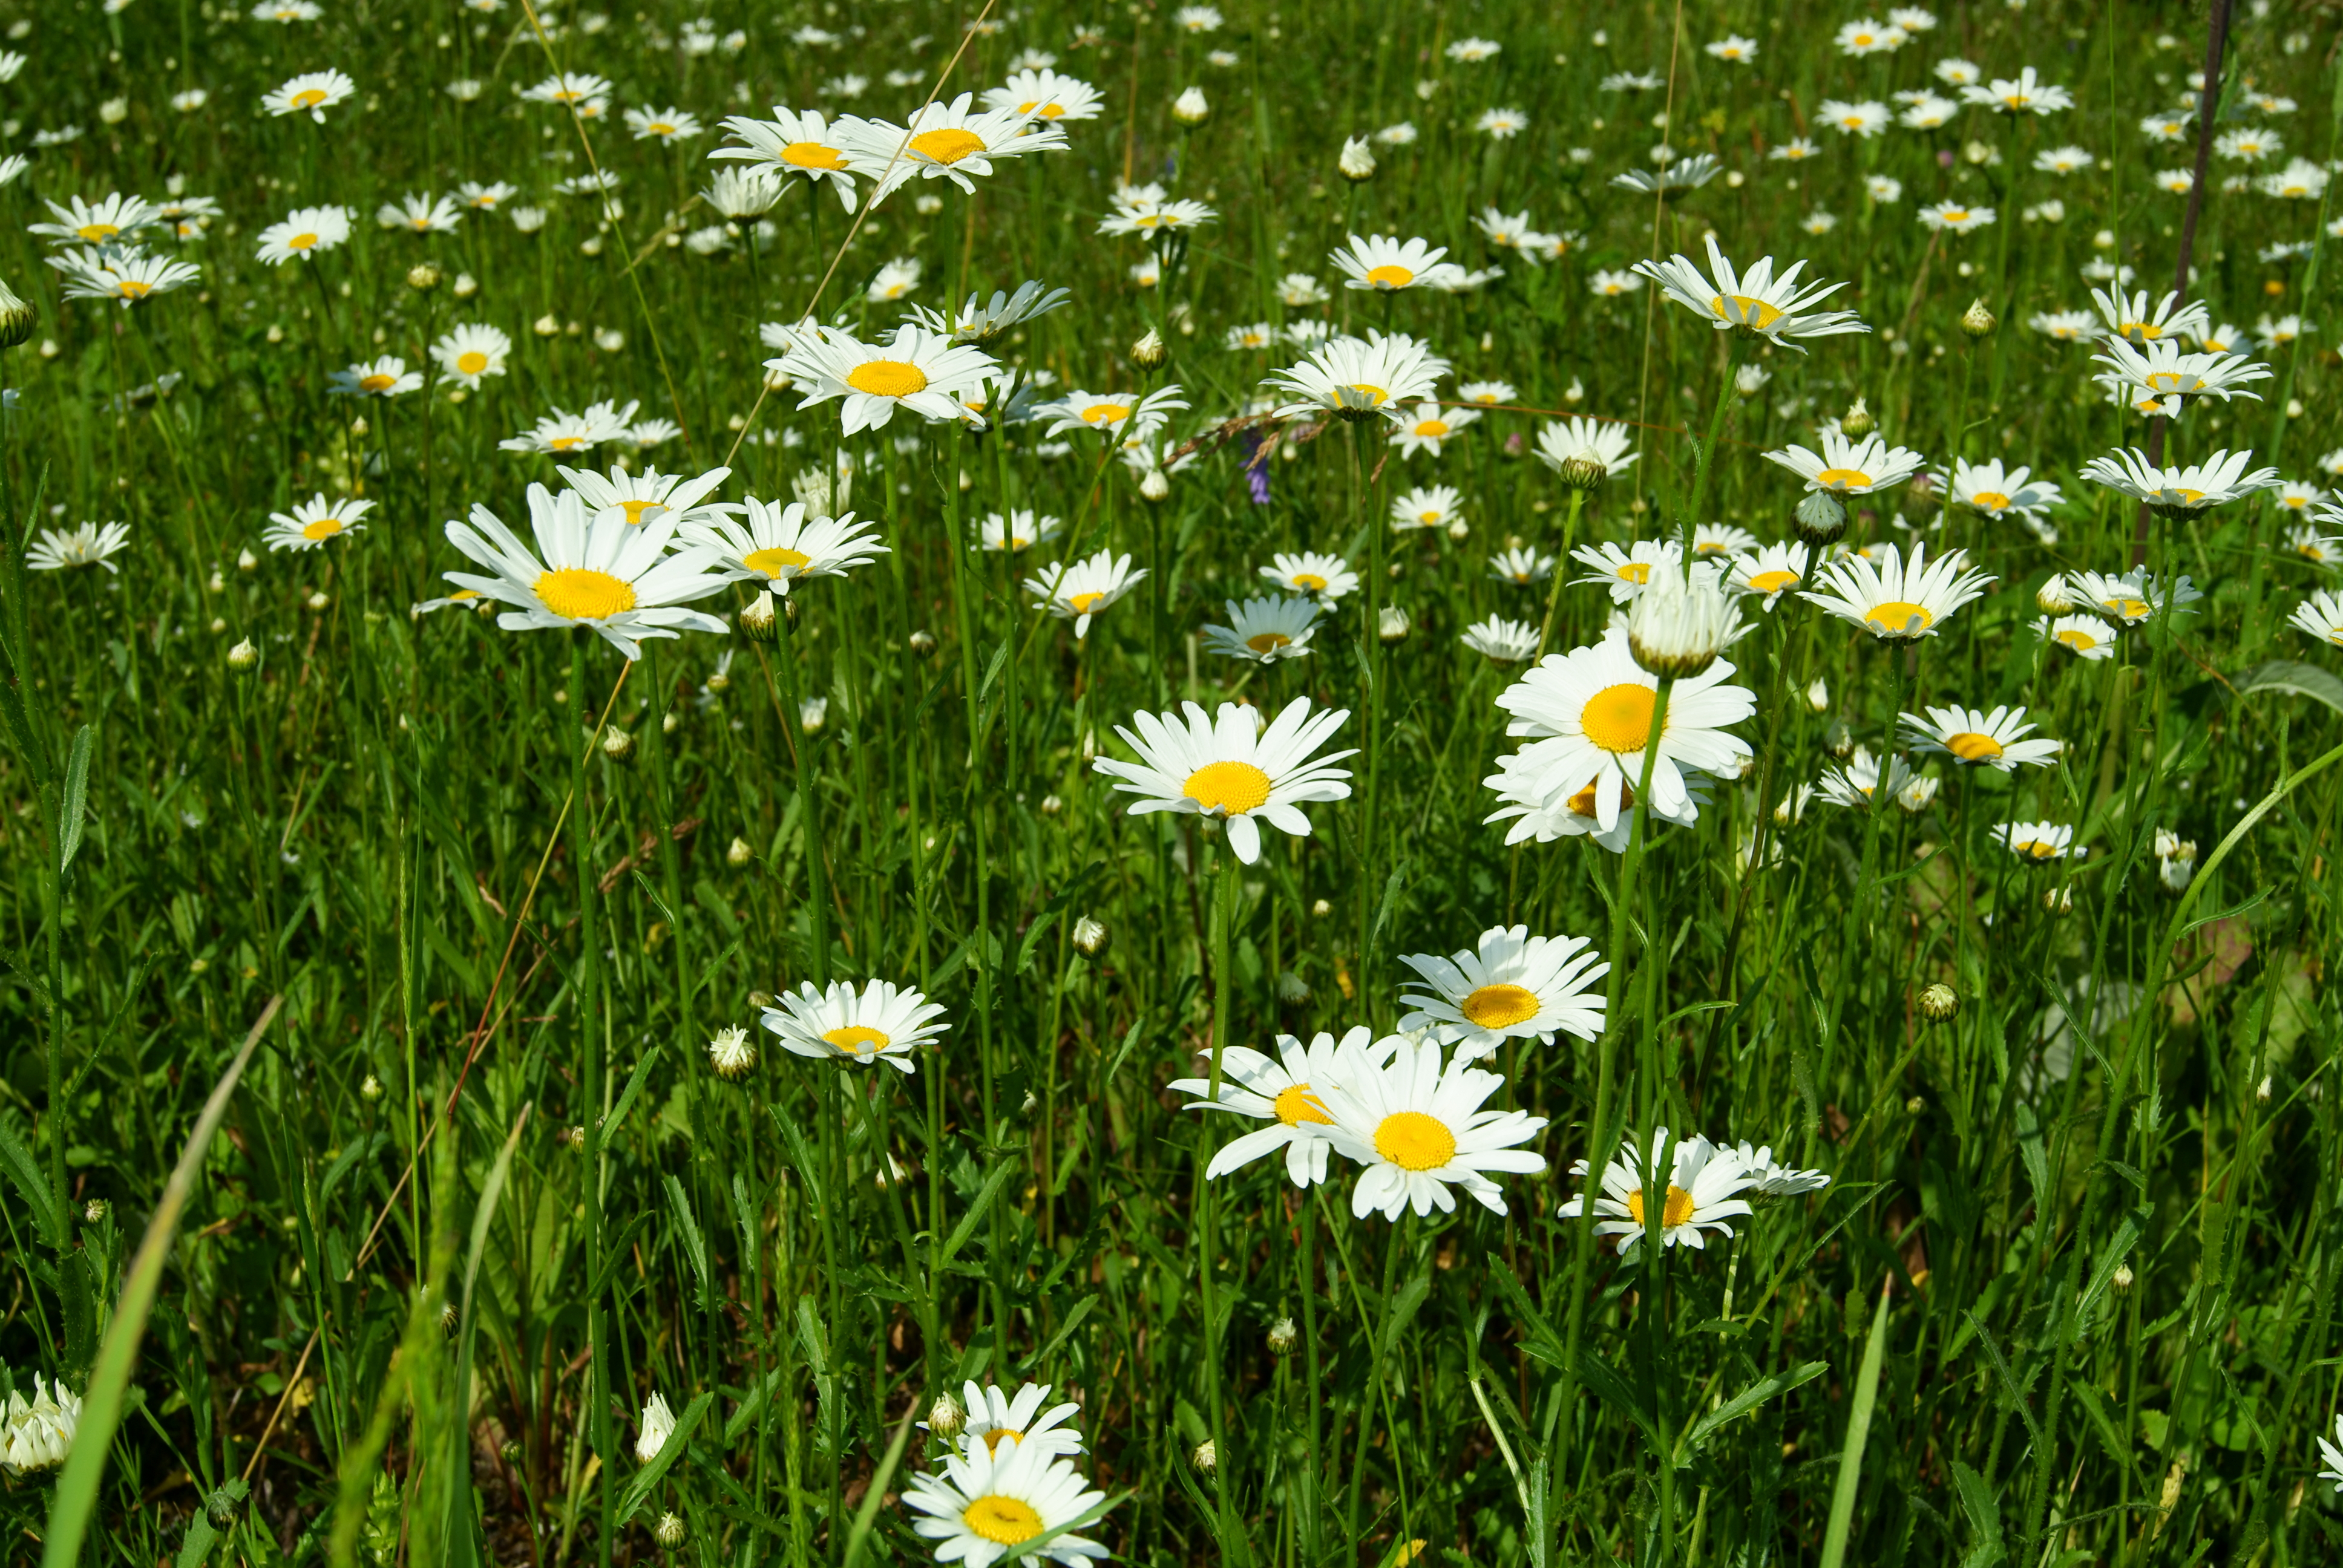 ромашки трава chamomile grass  № 3837825 загрузить